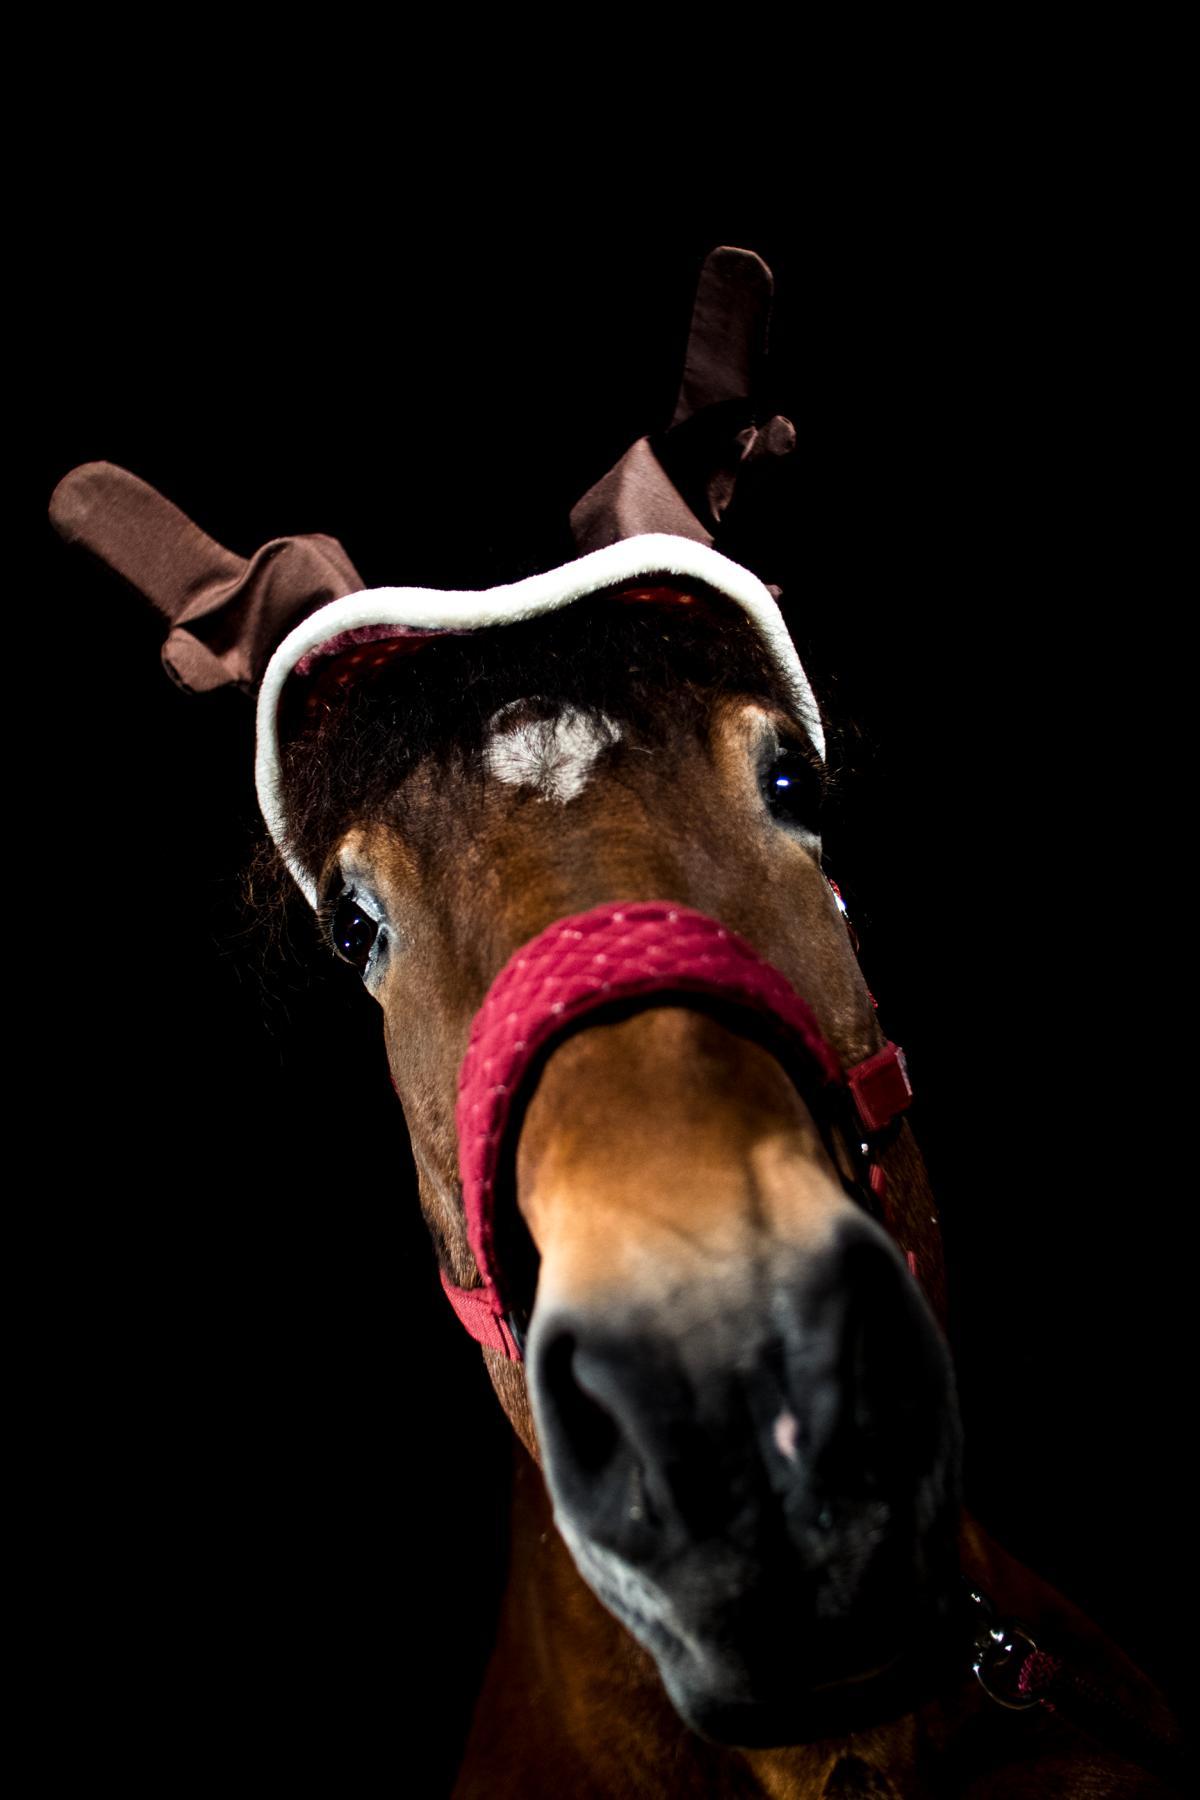 Weihnachten Dunkelshooting Kaltblut